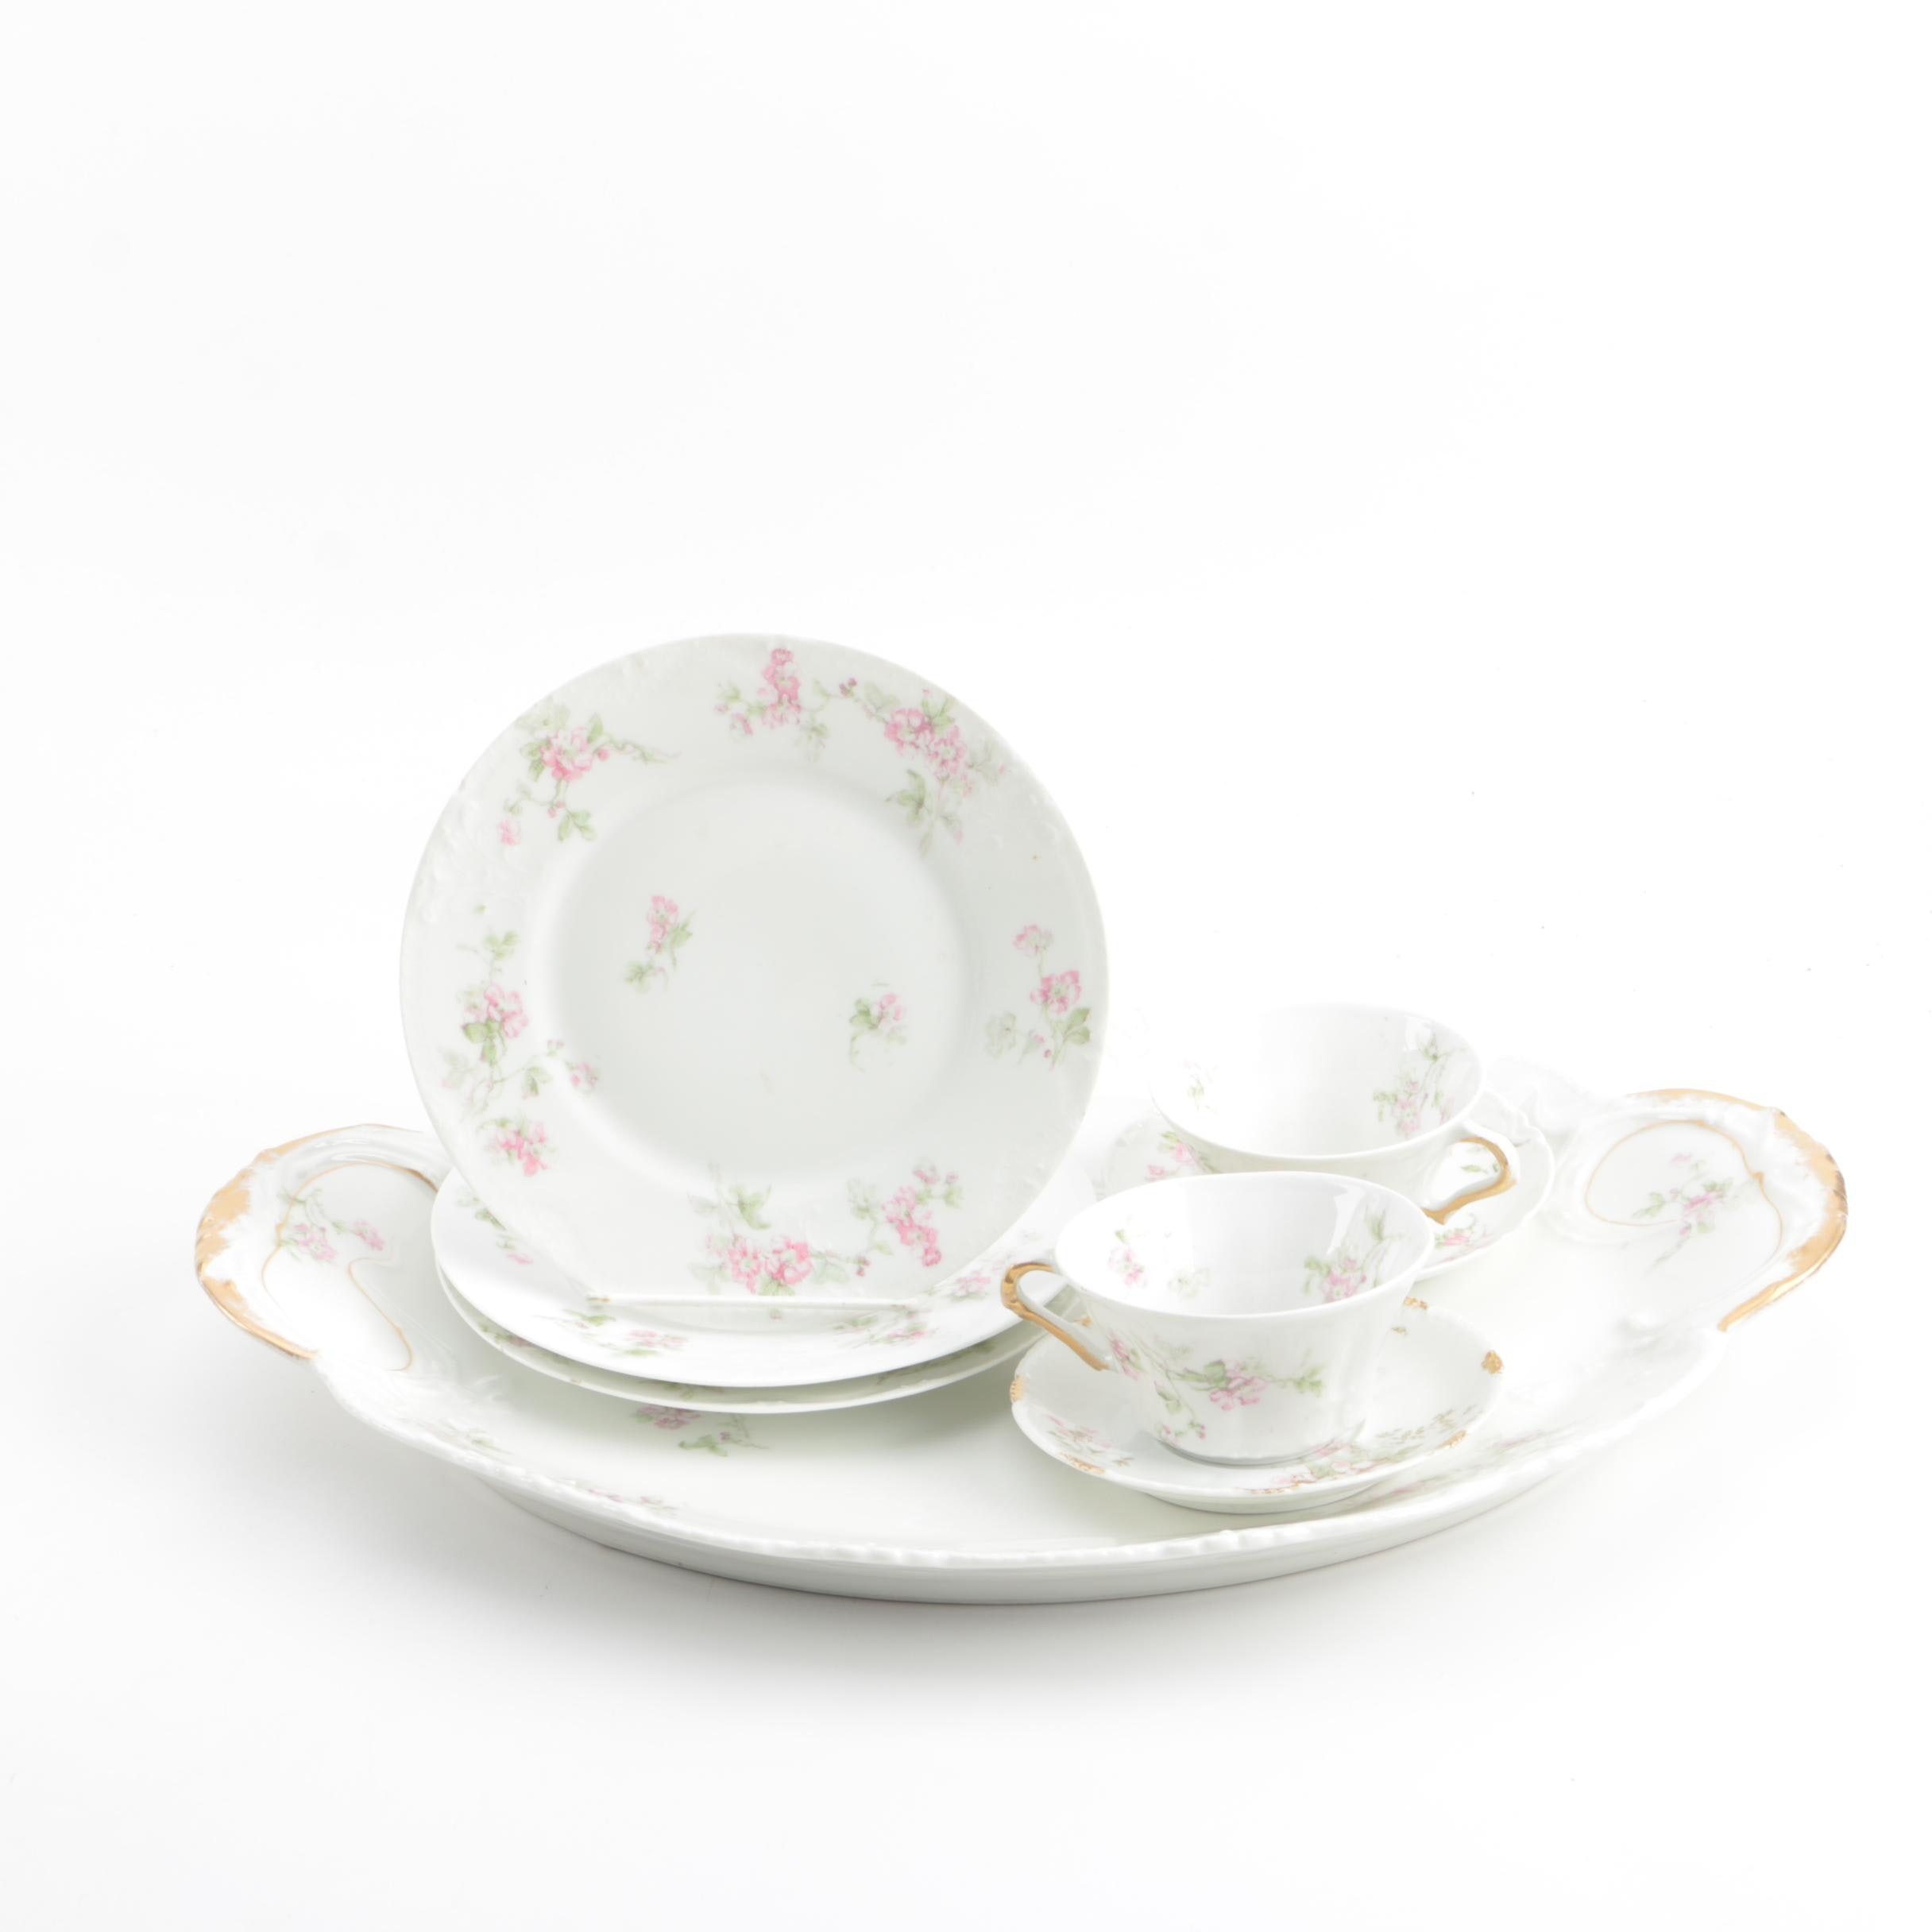 Vintage Theodore Haviland Limoges Porcelain Tableware